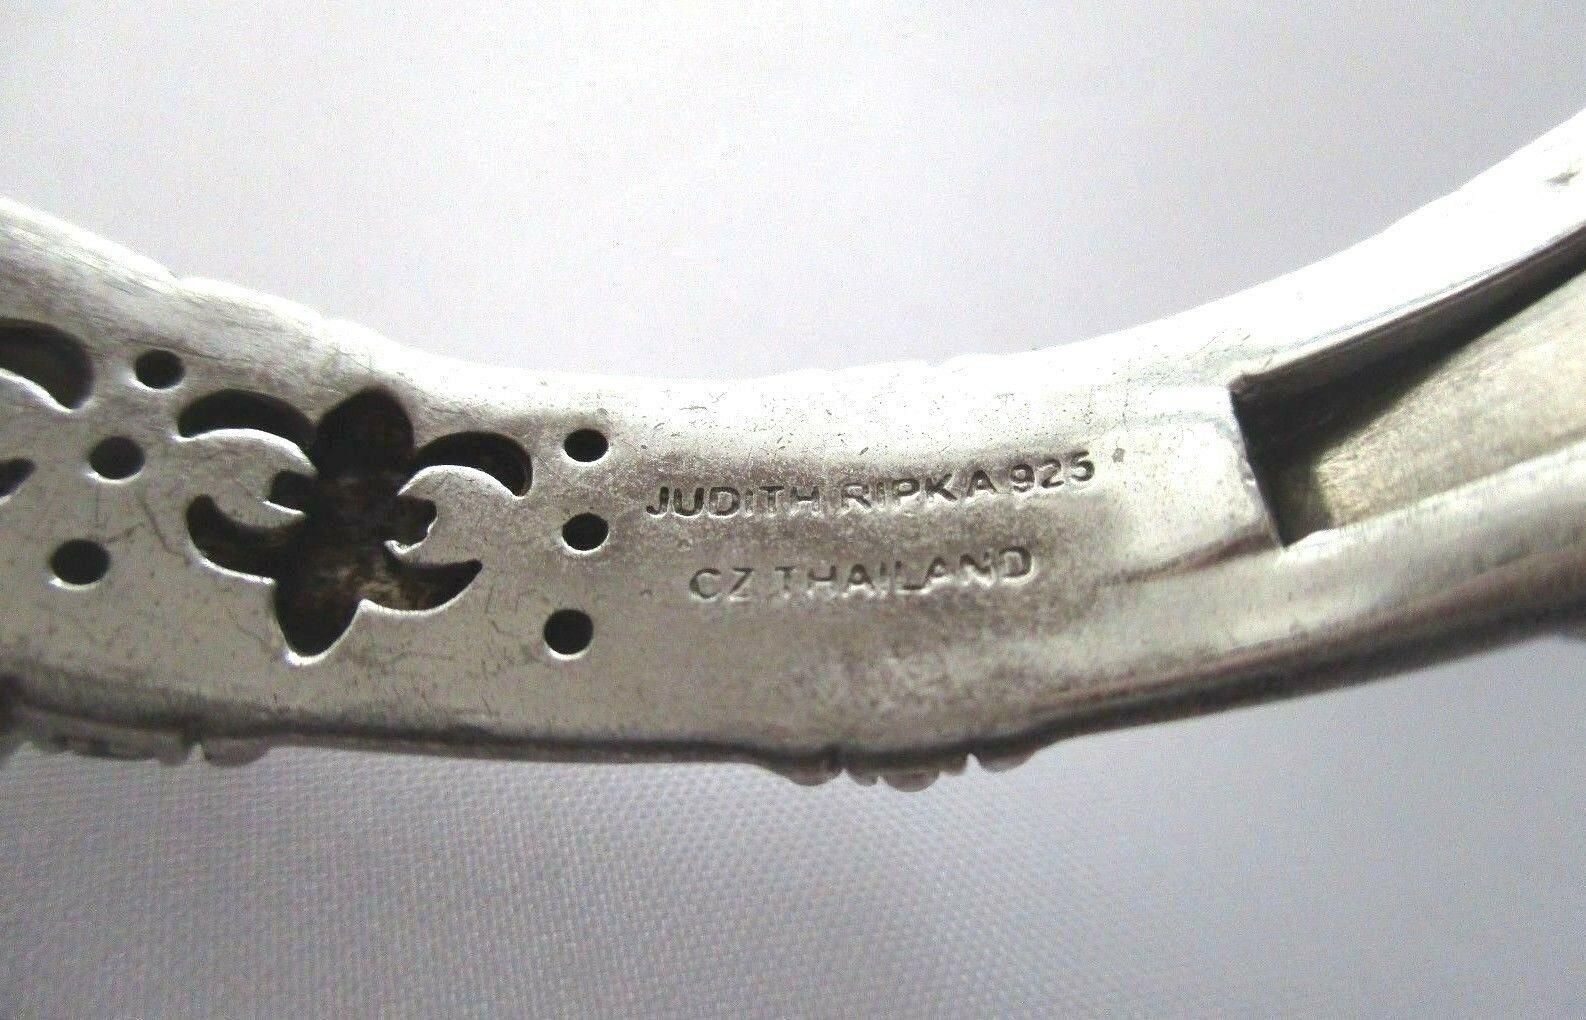 JUDITH RIPKA STERLING SILVER DIAMONIQUE CABLE CUFF BRACELET JR BOX & POUCH AVGE image 10